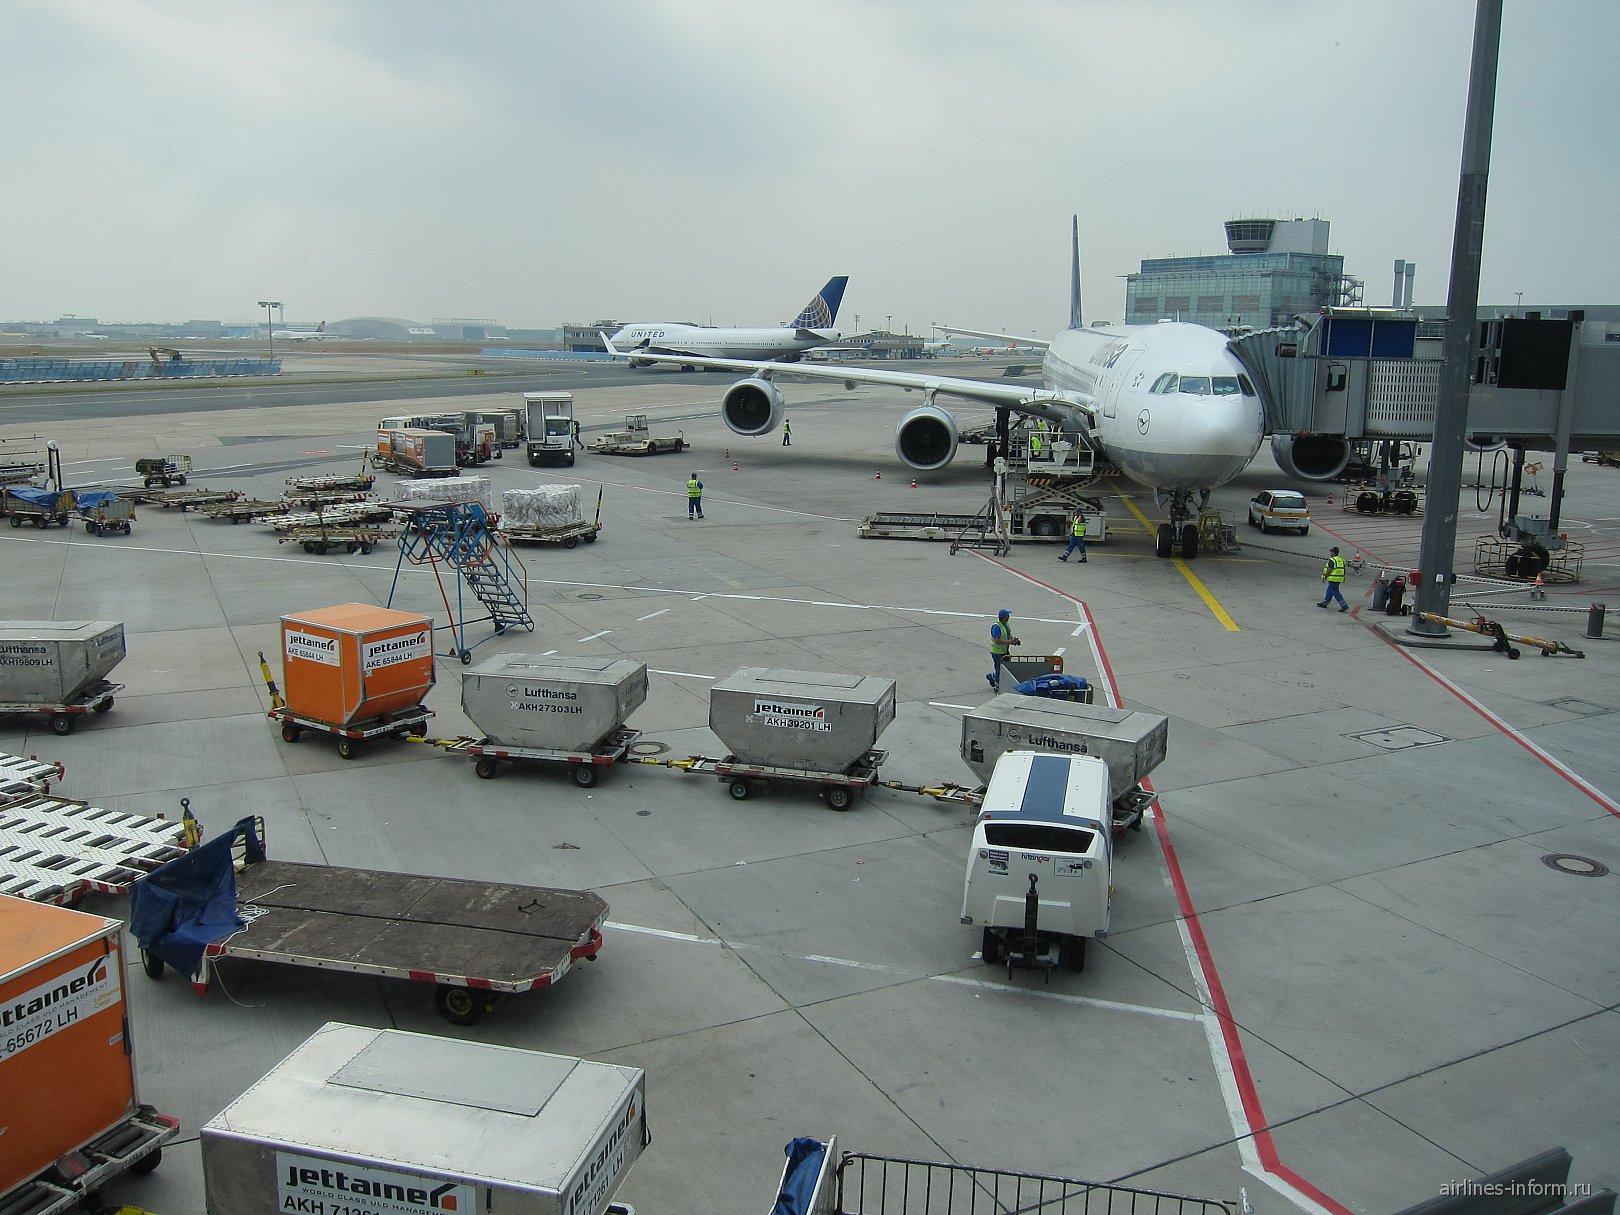 Самолет А340-600 авиакомпании Люфтганза в аэропорту Франкфурт